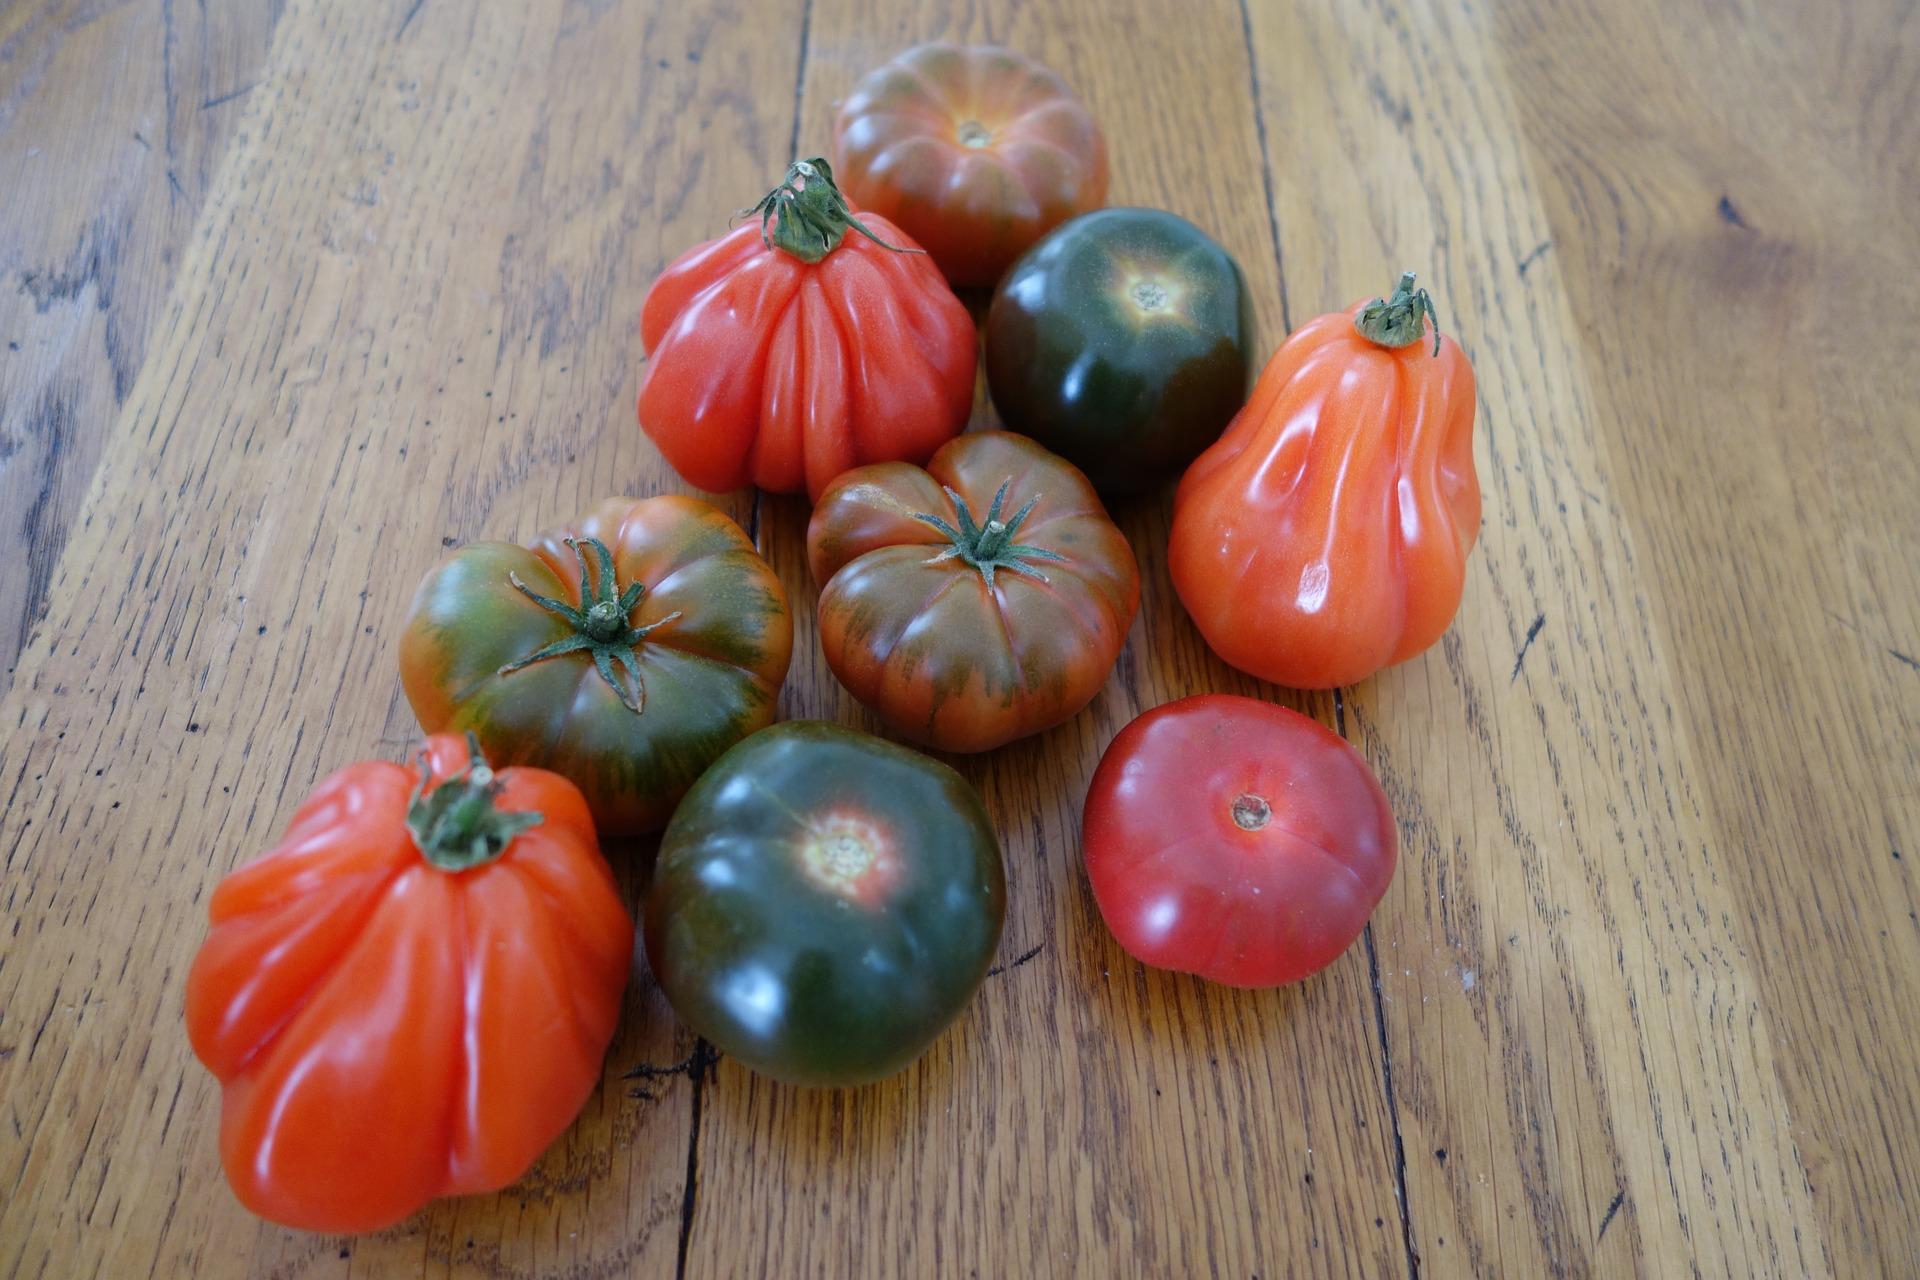 http://m.wm.pl/2018/04/orig/tomatoes-3311129-1920-460338.jpg